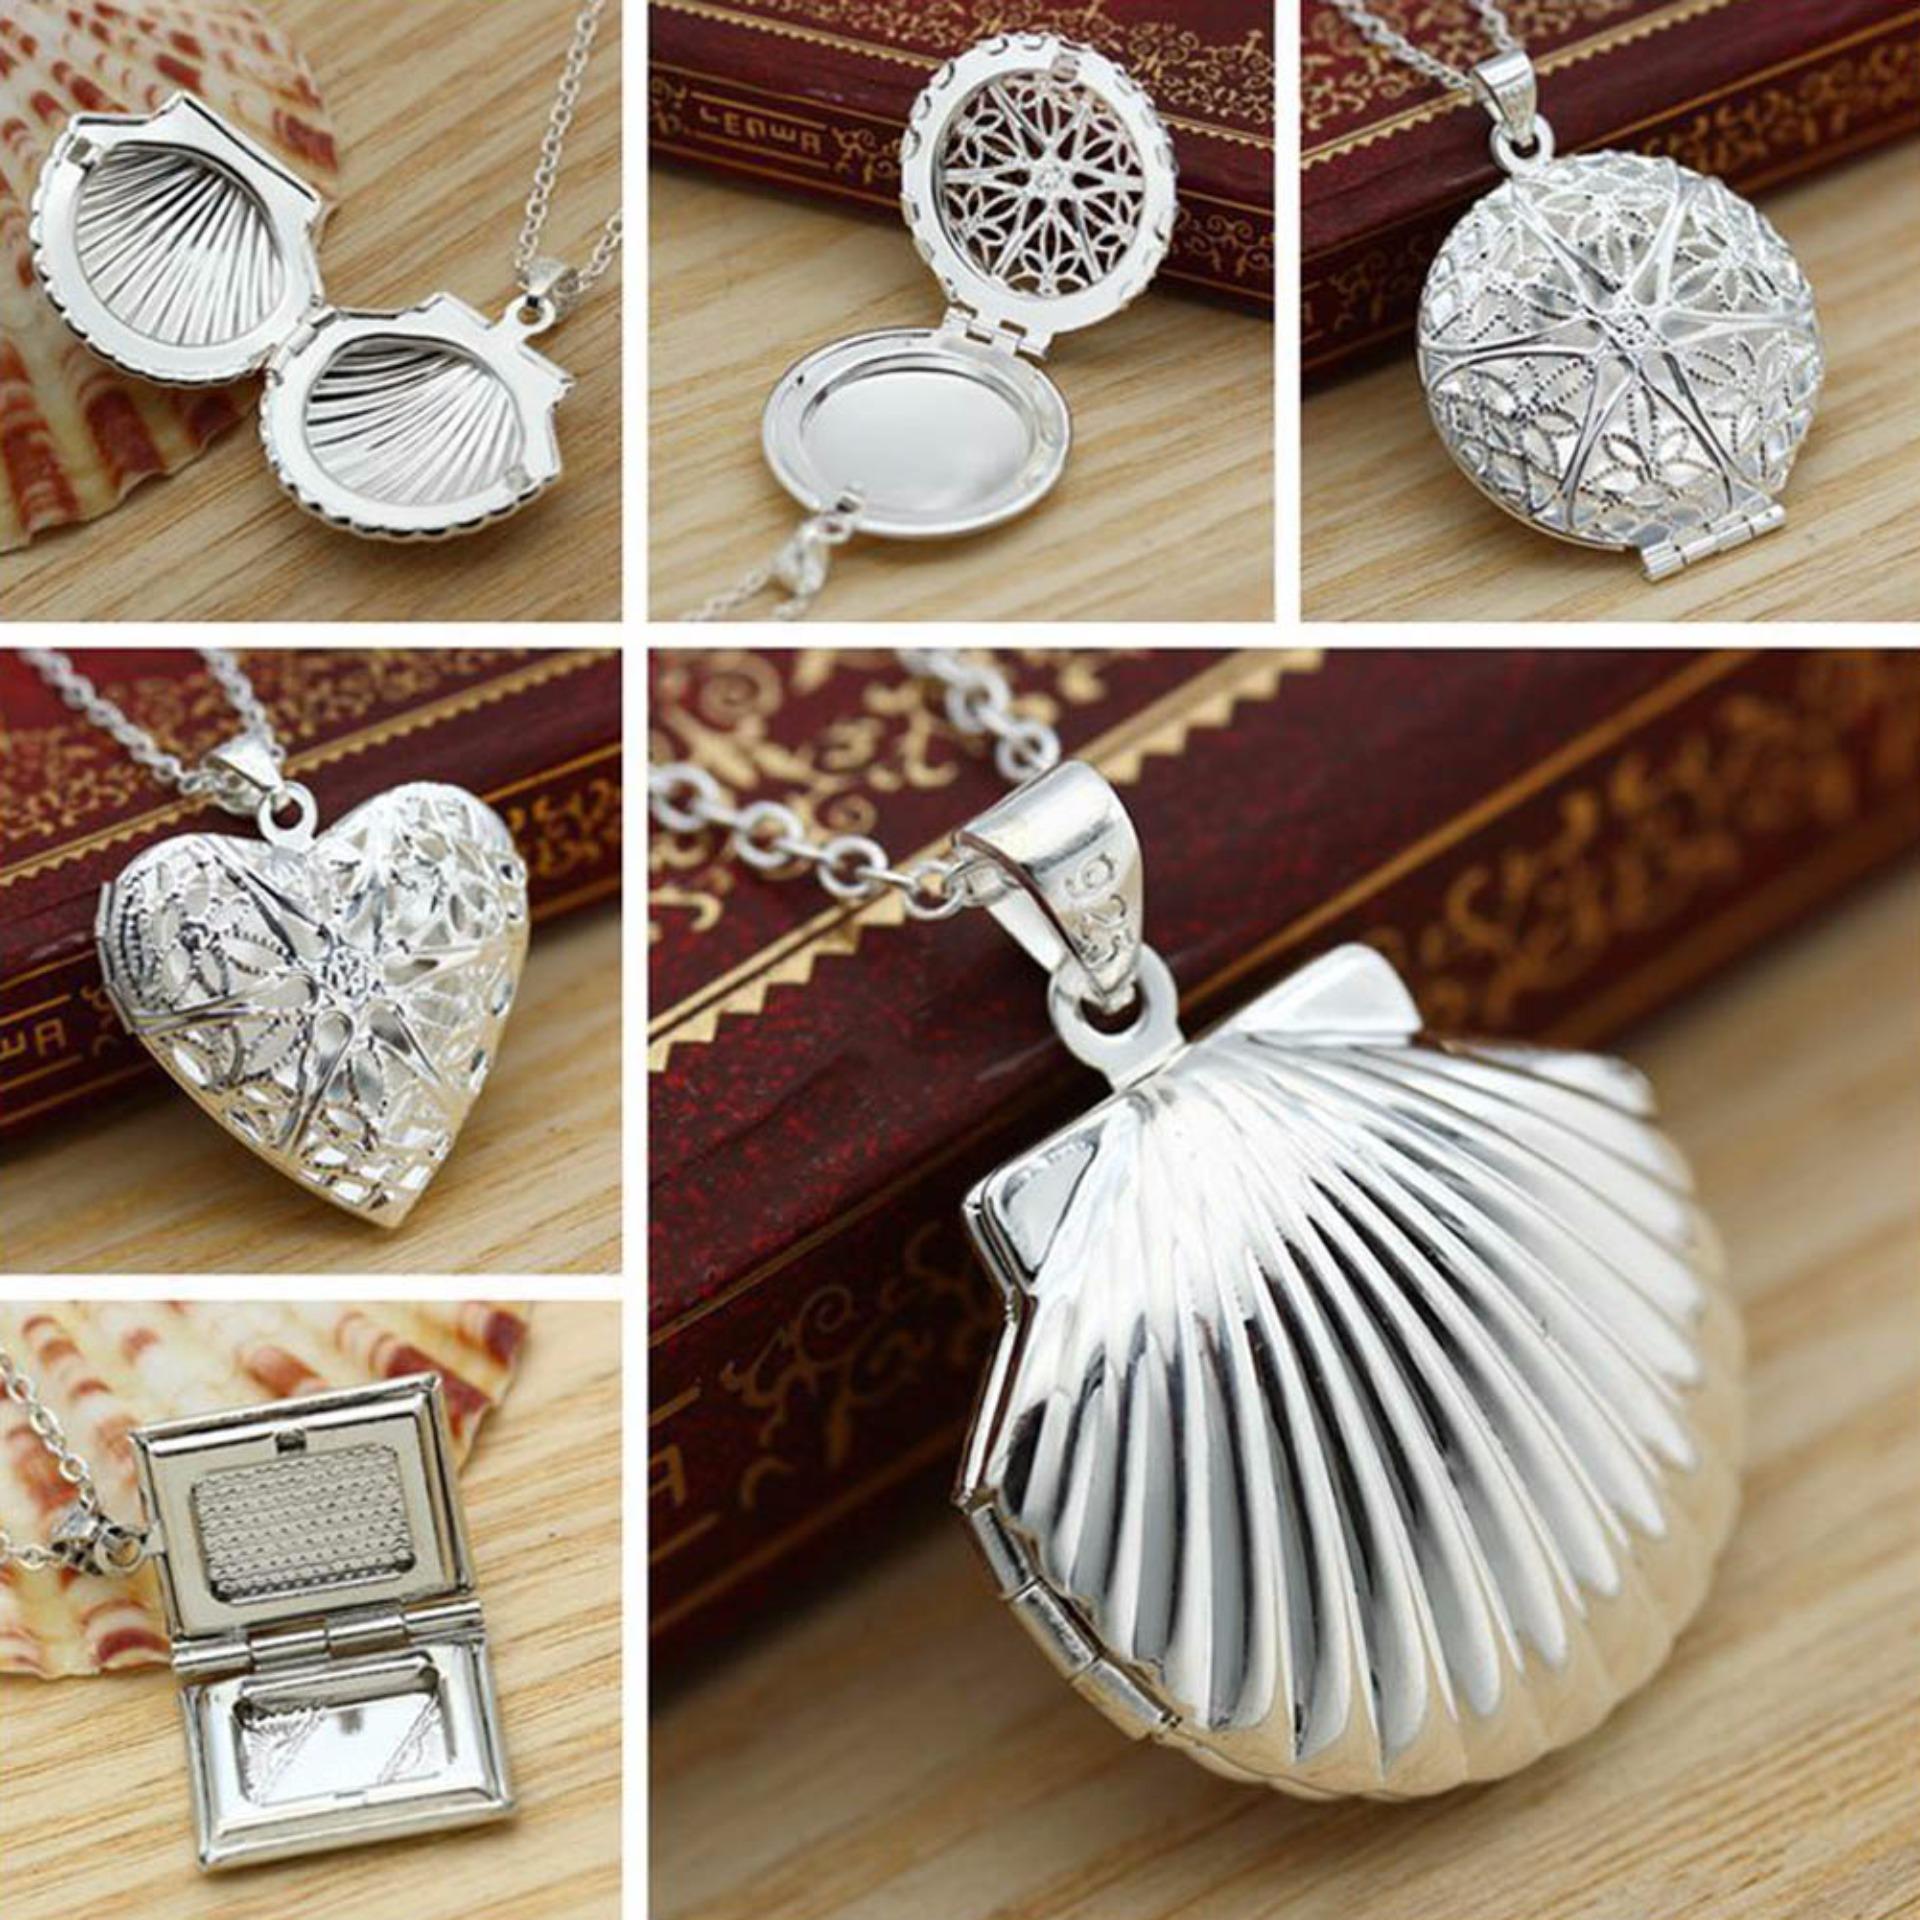 Hequ P167 fashion perhiasan kalung rantai 925 perak kalung liontin perak bersih menghabiskan bingkai foto akla